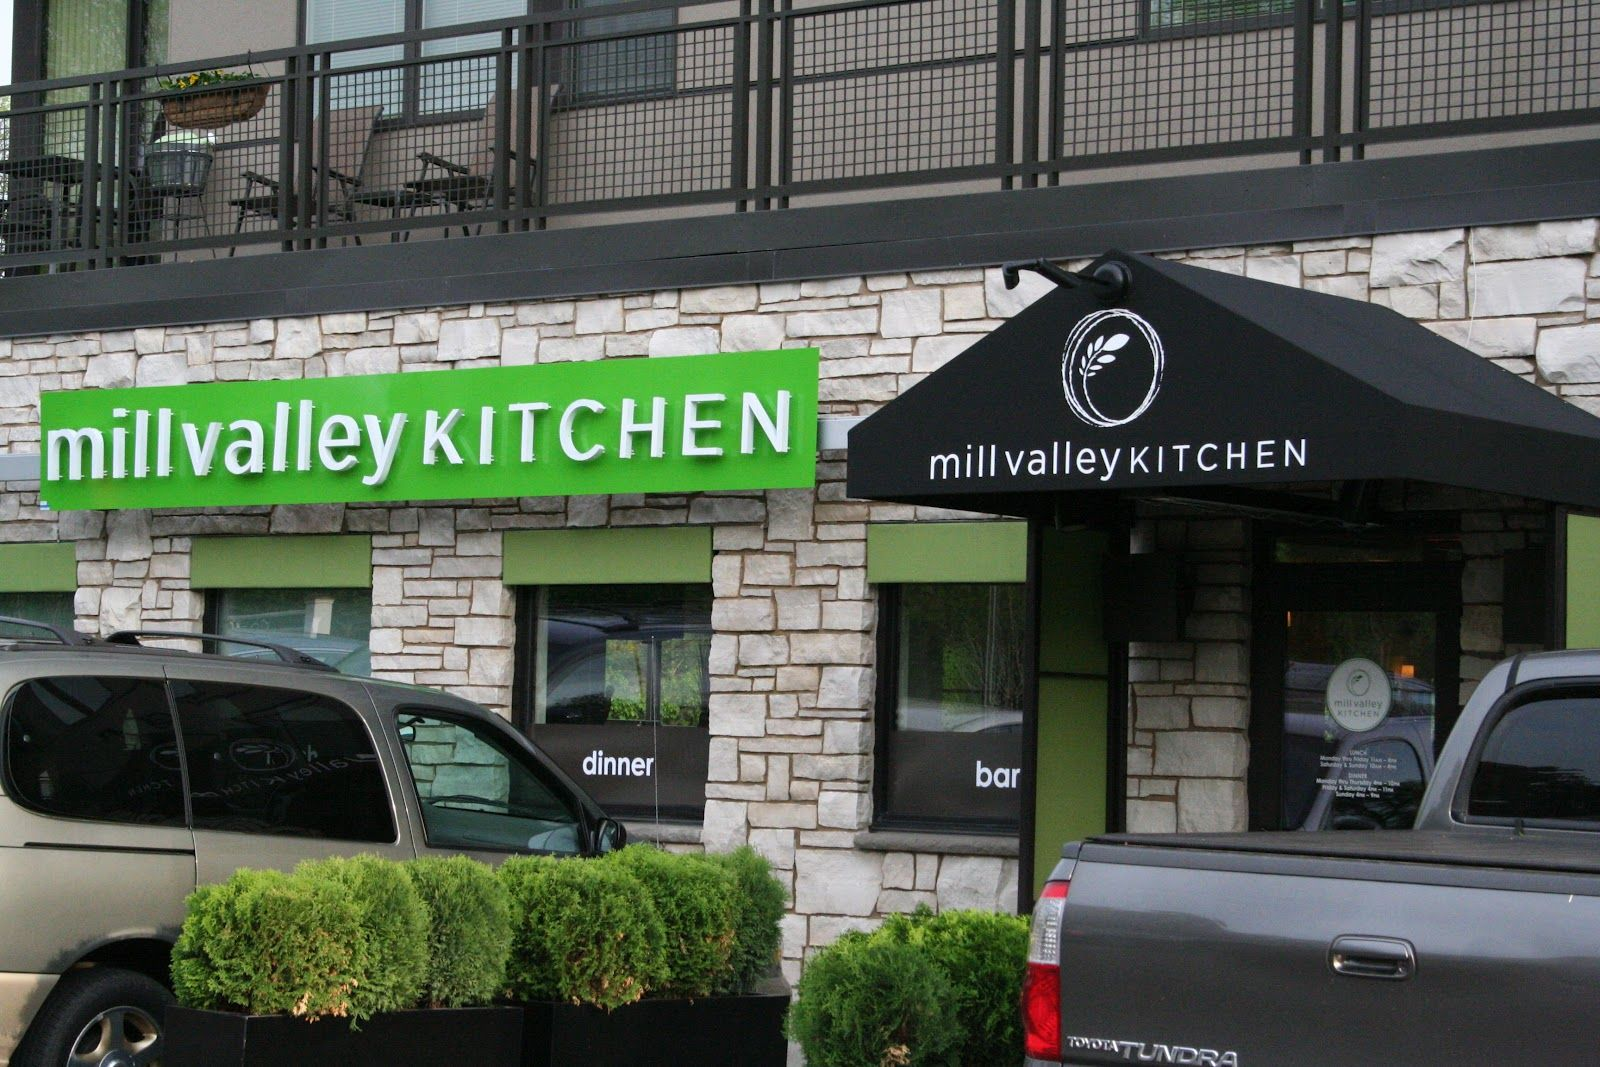 St louis park mill valley kitchen mill valley